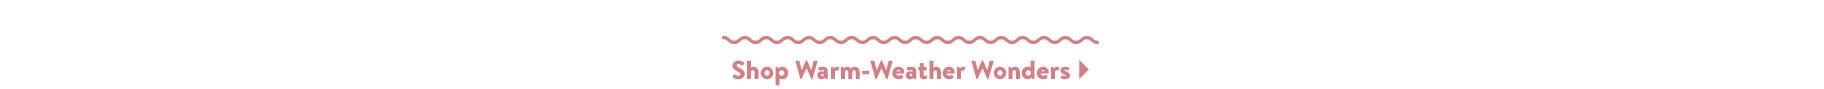 Shop Warm-Weather Wonders.